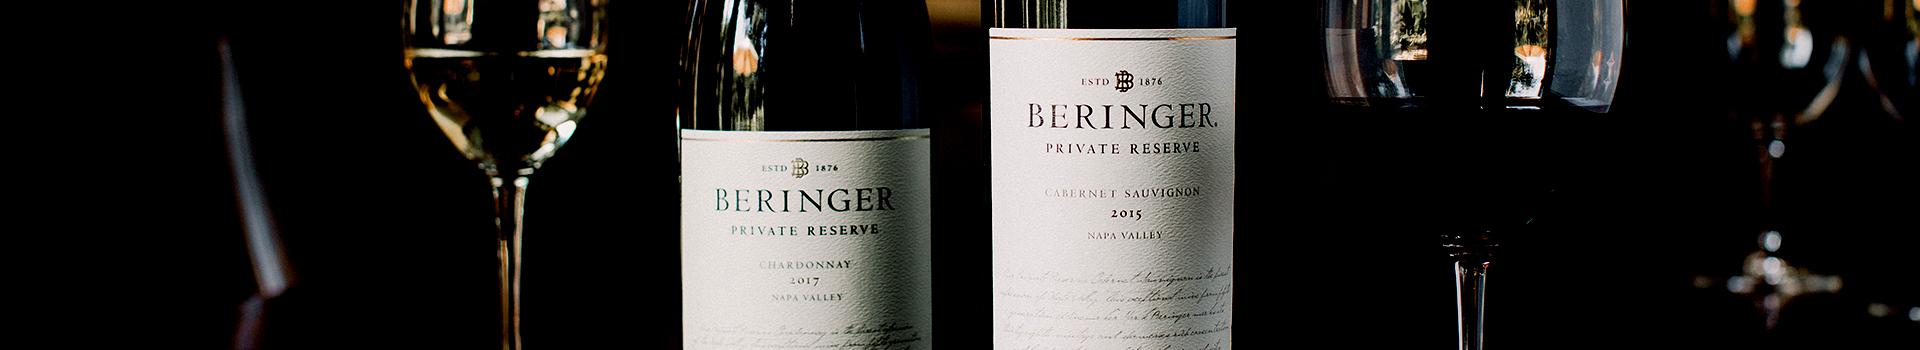 Beringer Private Reserve Chardonnay & Cabernet Sauvignon